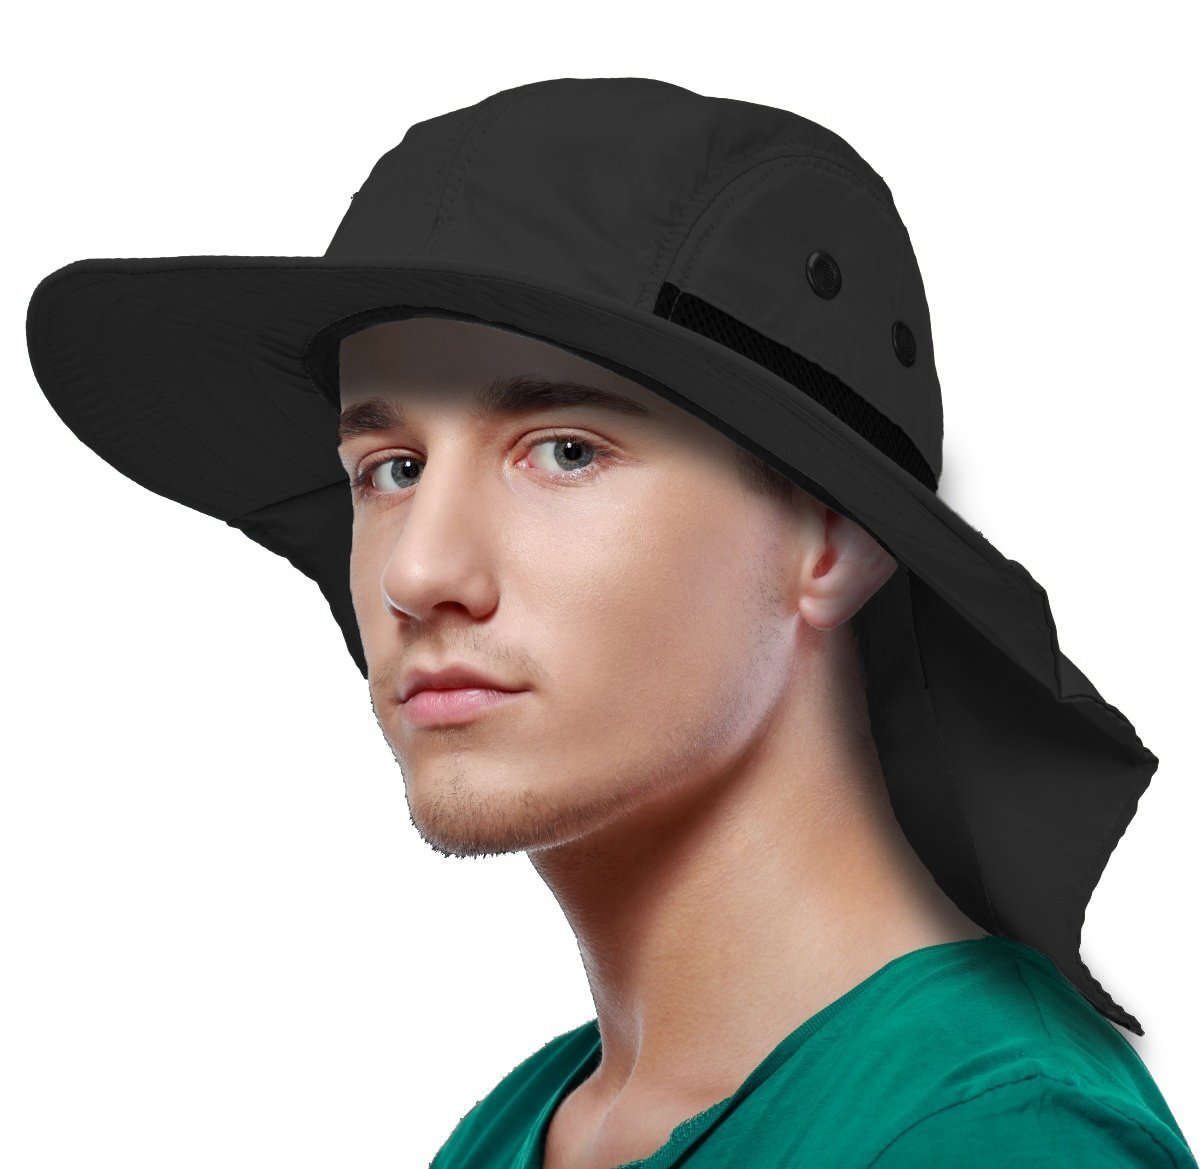 New Outdoor Foldable Sun Umbrella Hat Camping Headwear Foldable Head Cap USA KUS